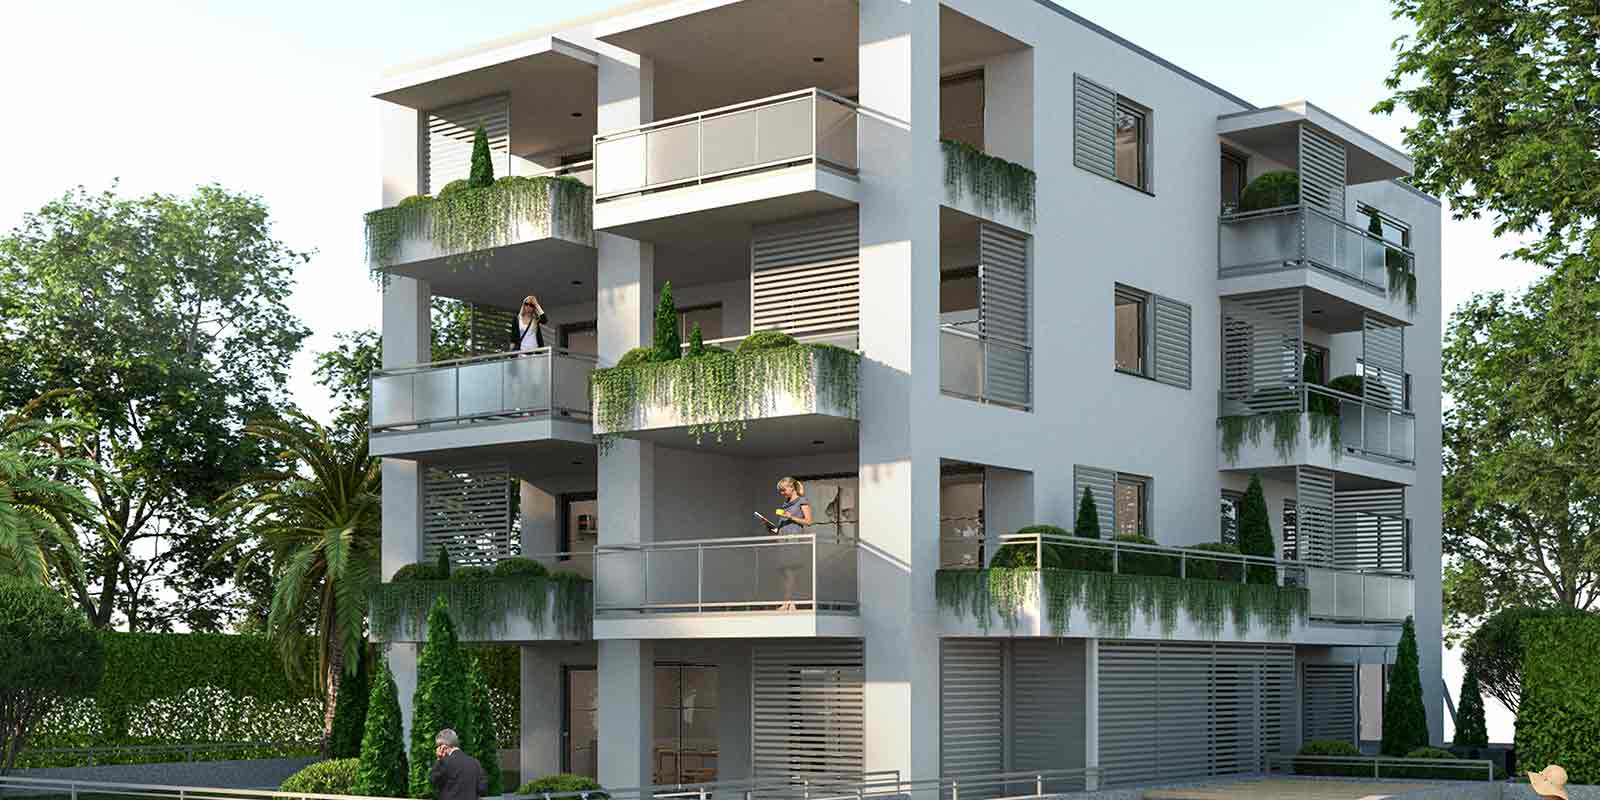 Residence-Alfieri-1600x800